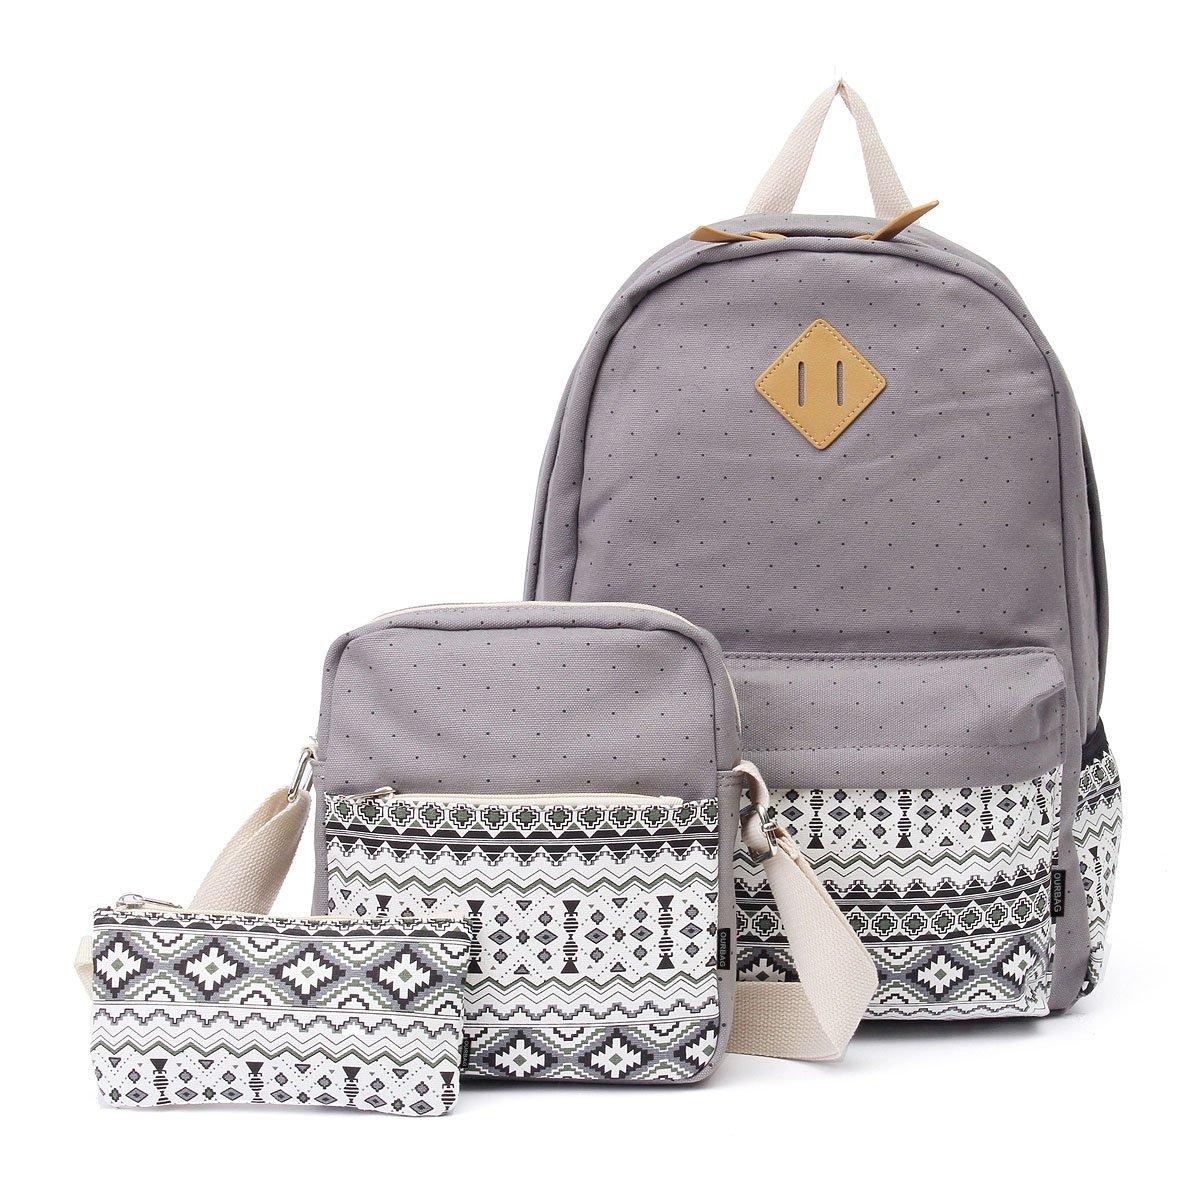 OURBAG Canvas Casual Lightweight Backpack Schoolbag Shoulder Bags Wallet for Women Girls 3PCS Set Grey